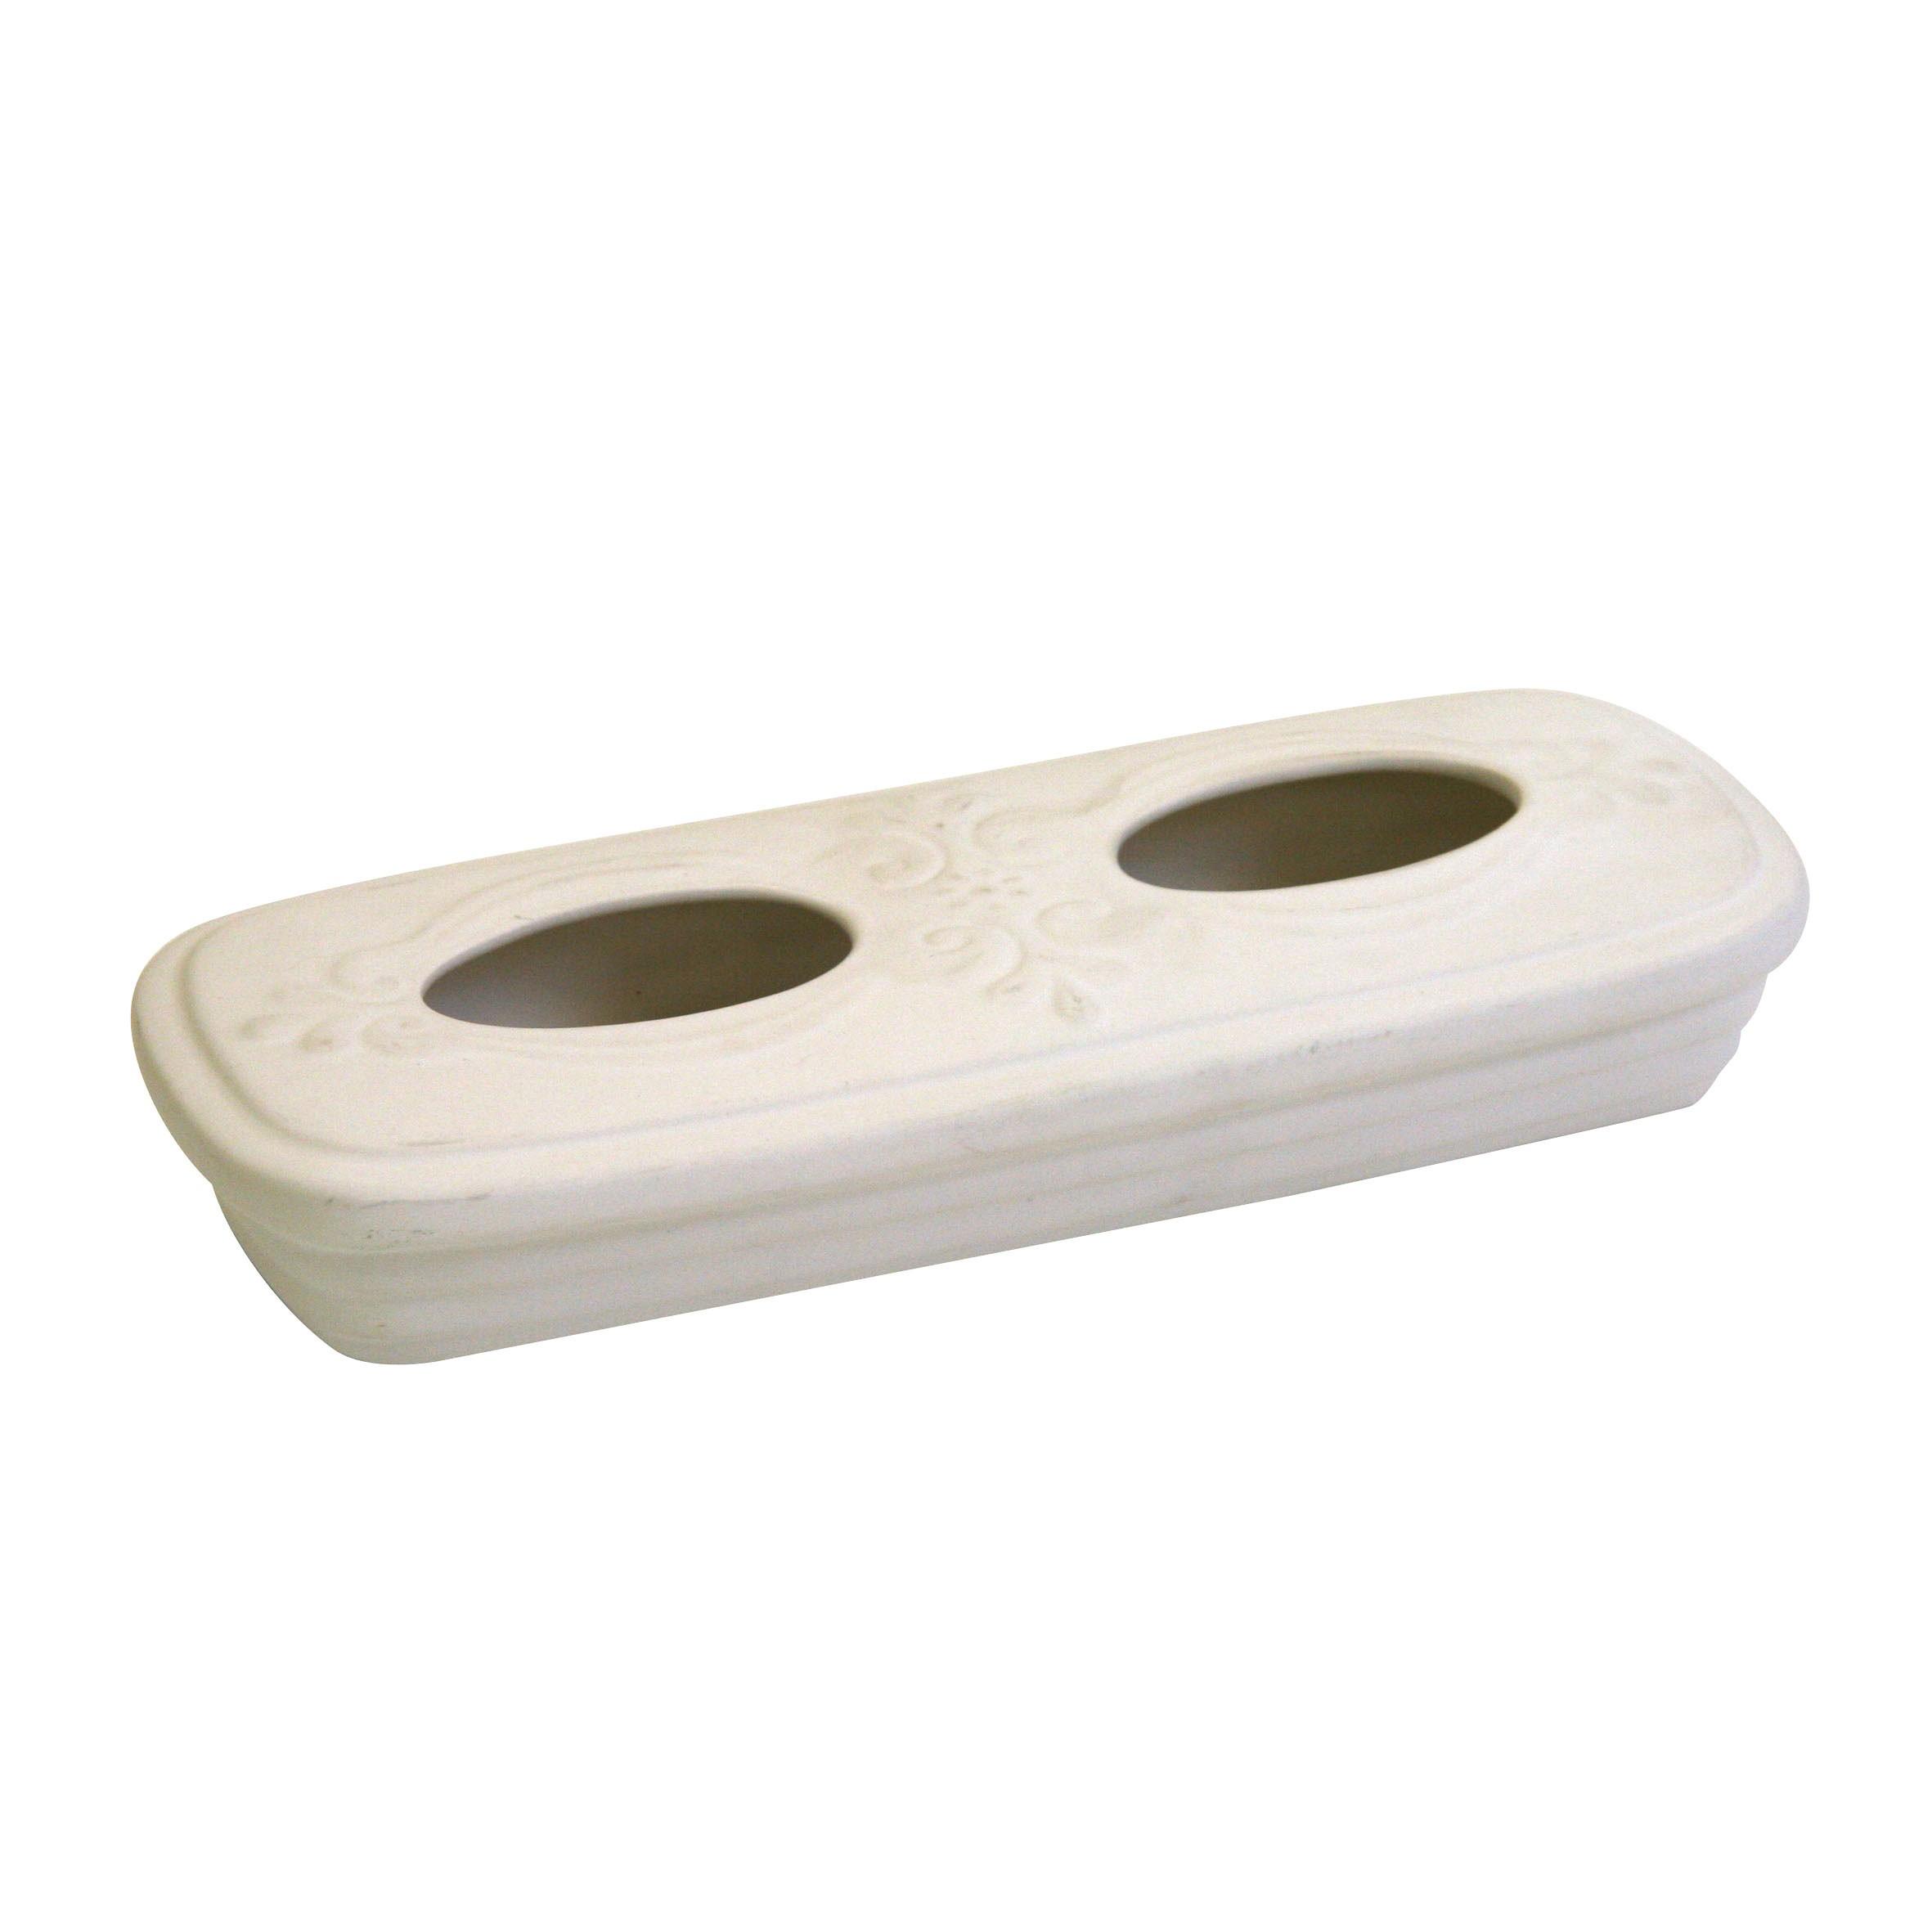 verdunster luftbefeuchter kaminoflam keramik wei relief. Black Bedroom Furniture Sets. Home Design Ideas